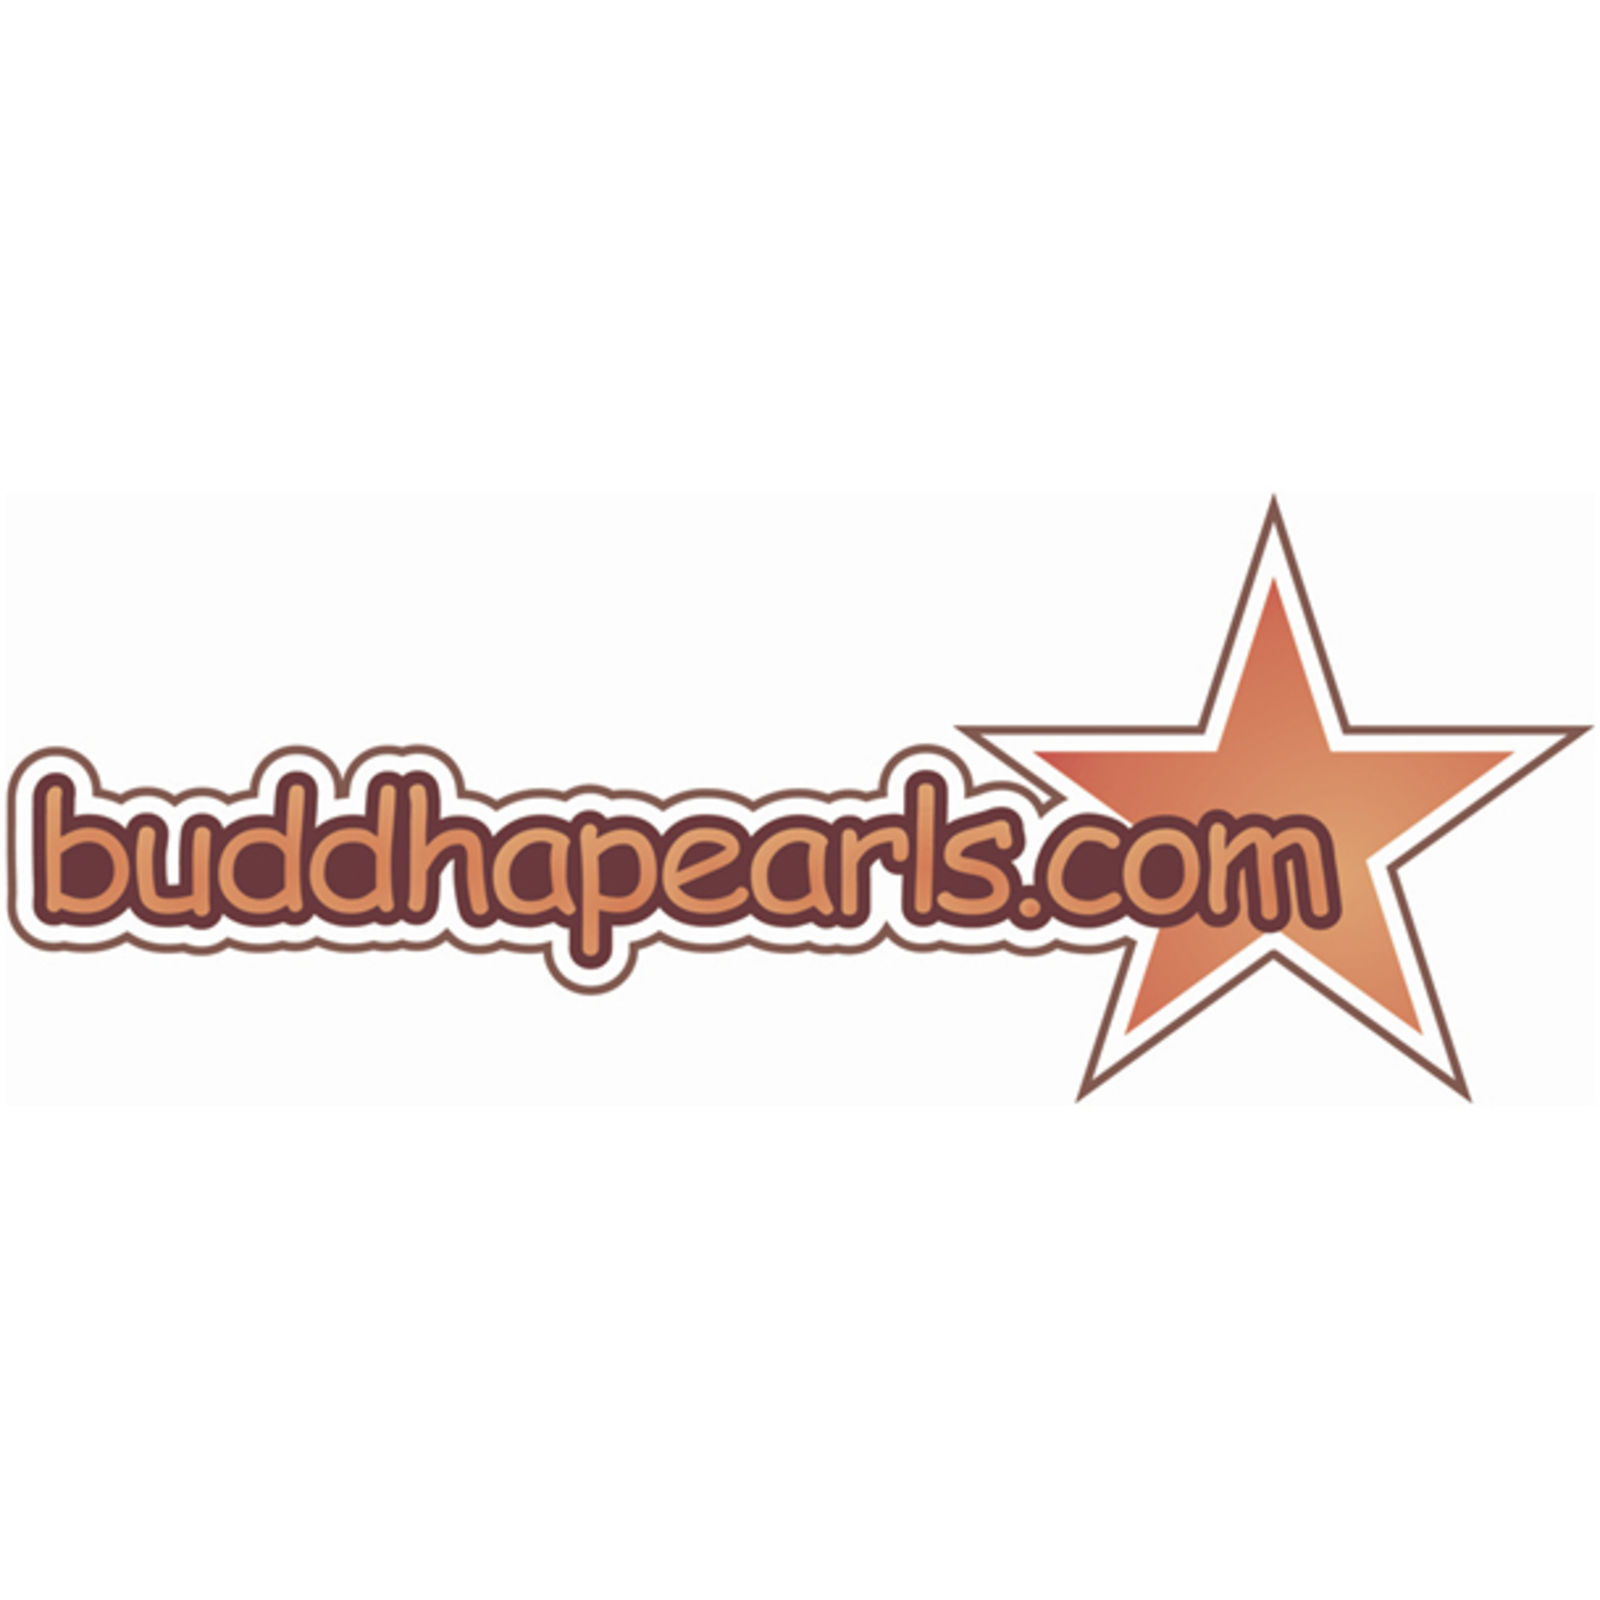 BUDDHAPEARLS